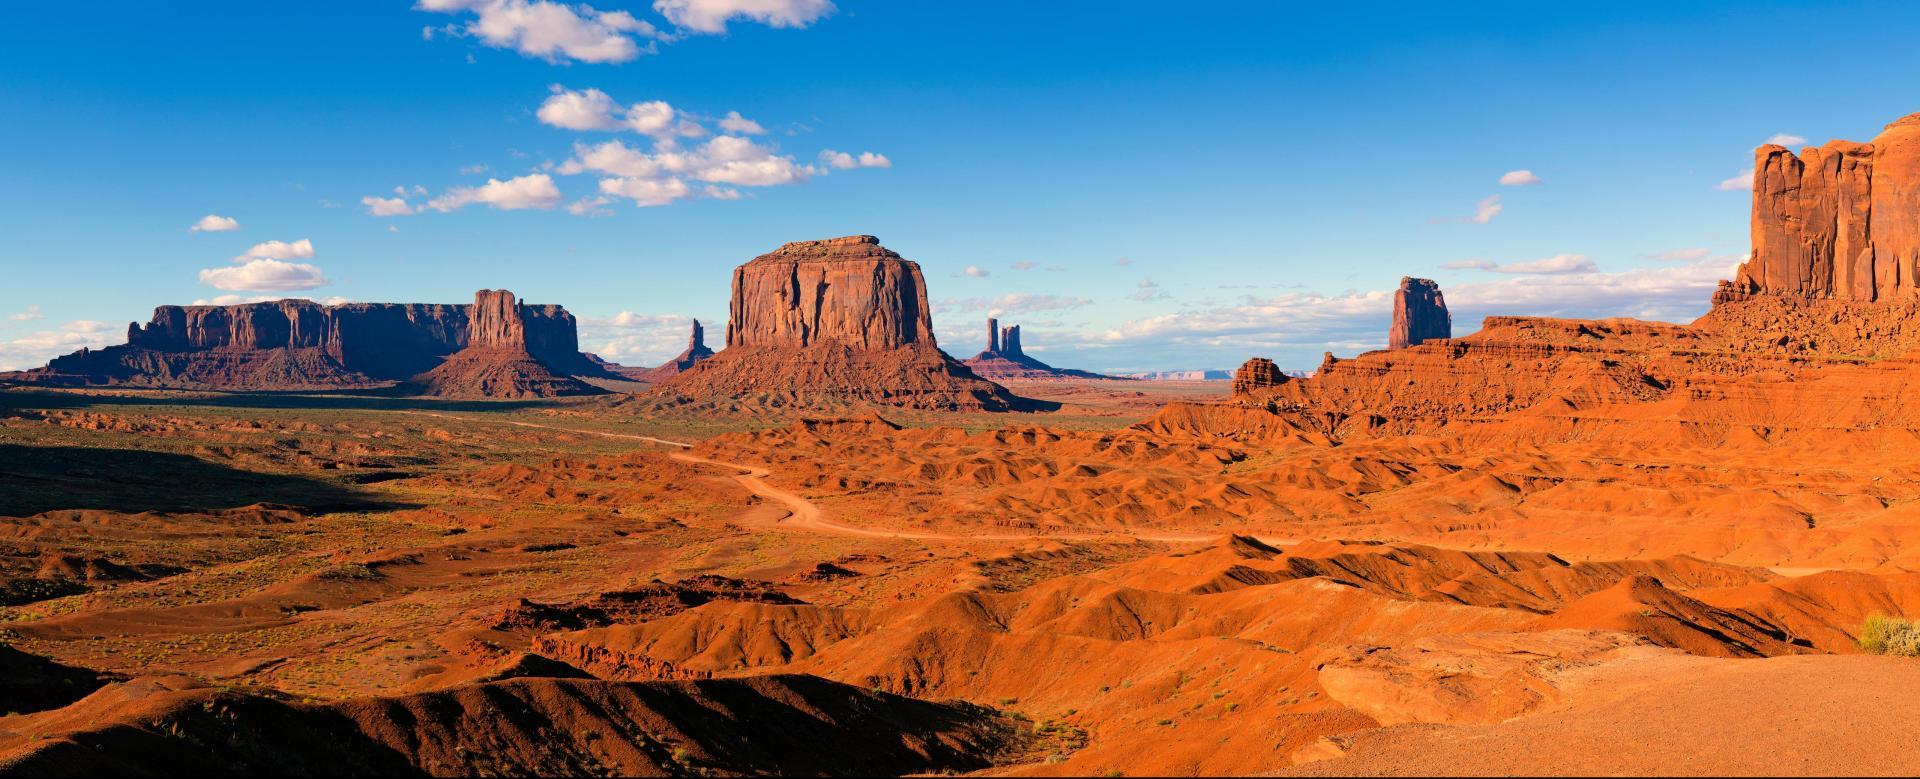 Trek Grand Canyon Les Parcs Mythiques Randonnee Etats Unis